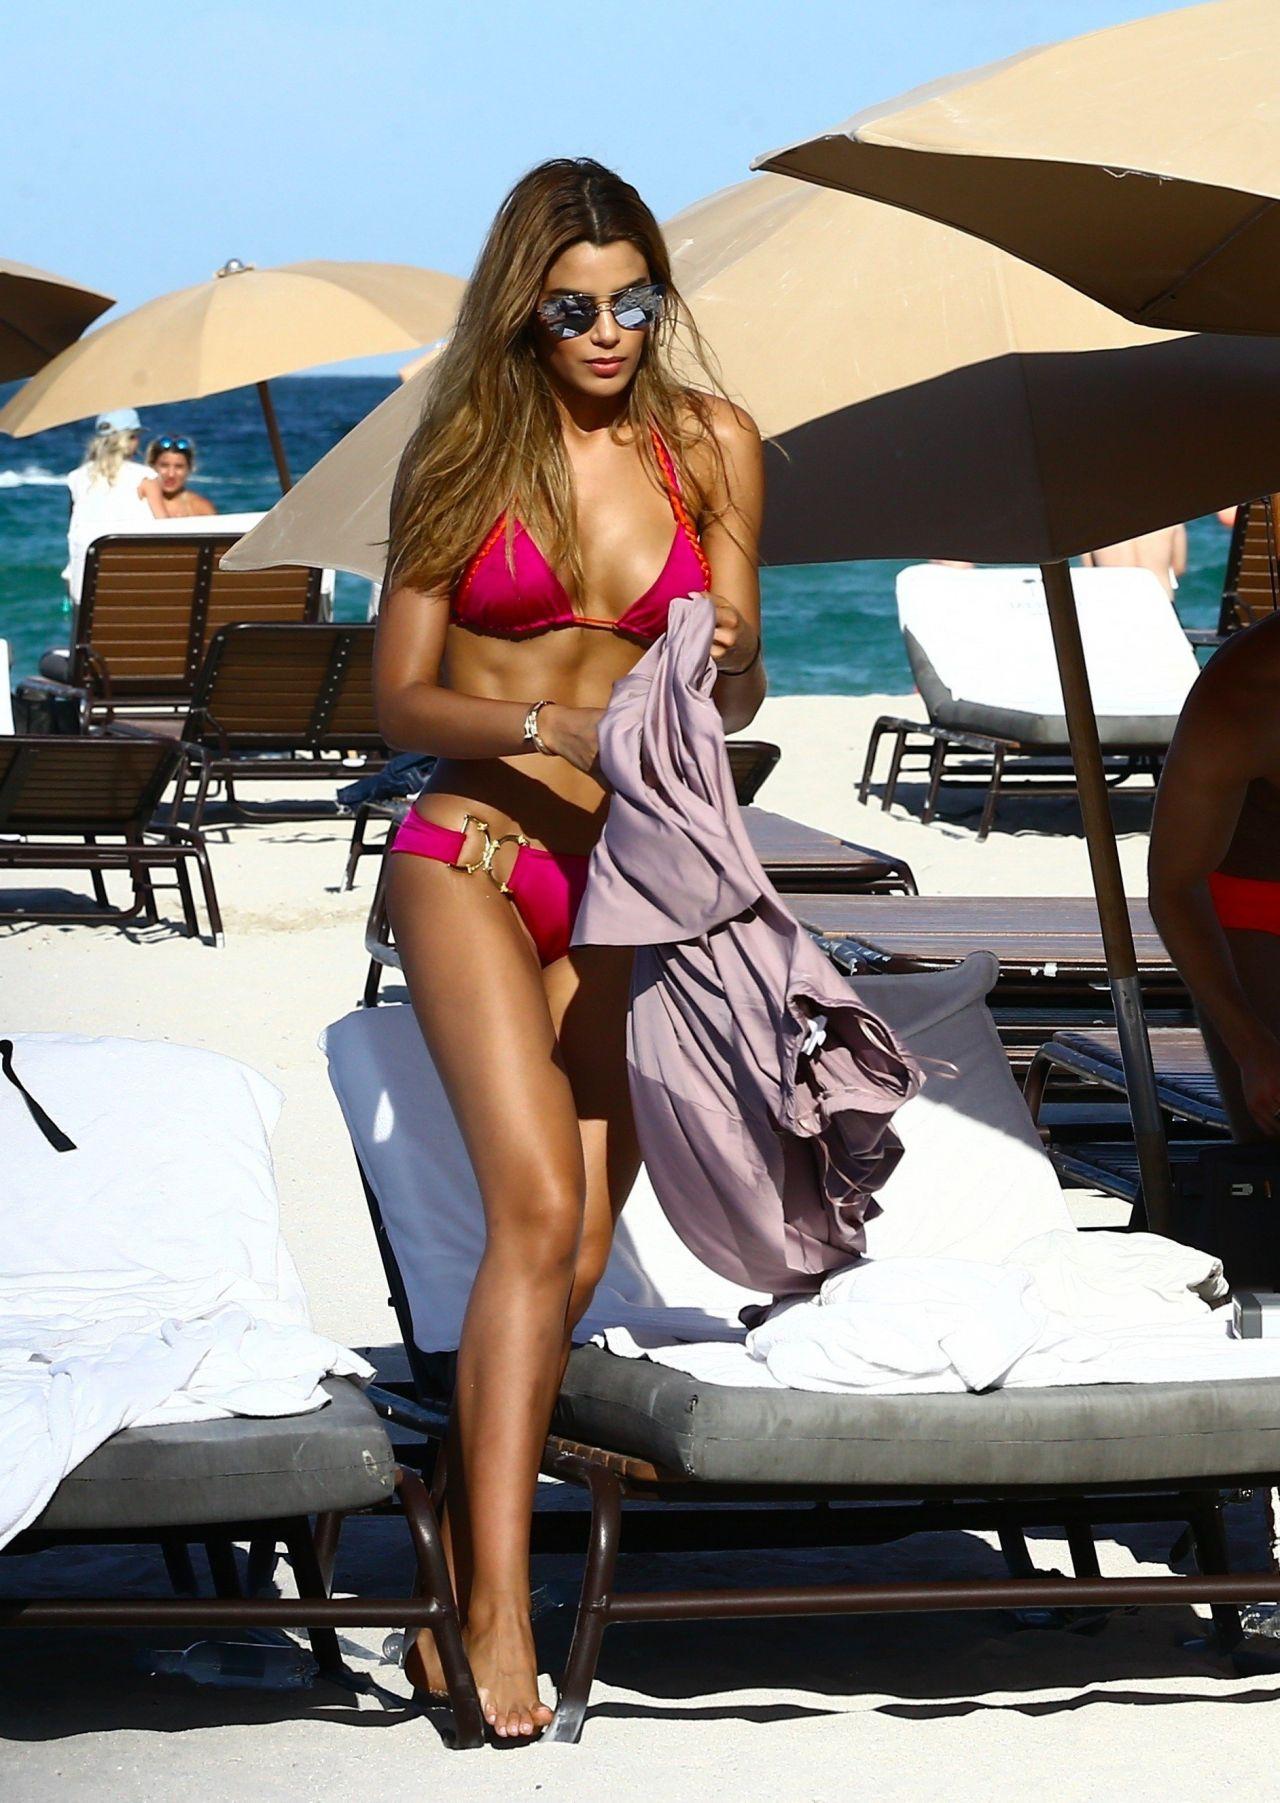 Bikini Ariadna Gutierrez nudes (68 photos), Tits, Sideboobs, Twitter, legs 2017